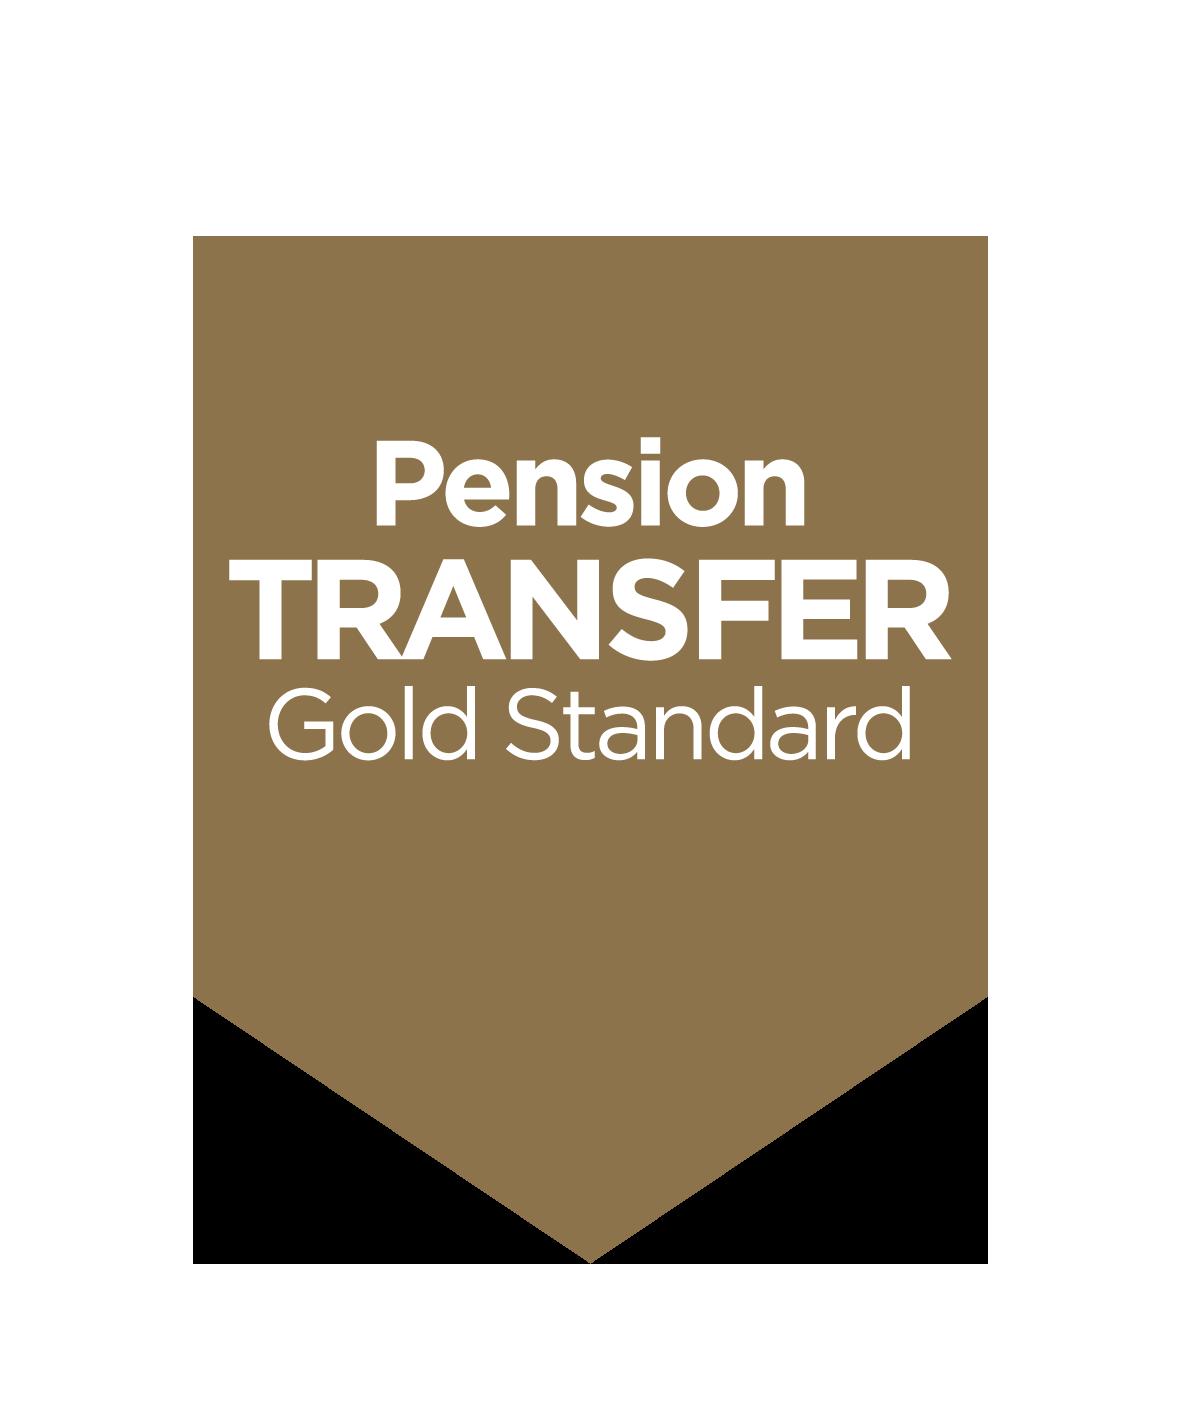 Pension Transfer Gold Standard Sutherland Independent